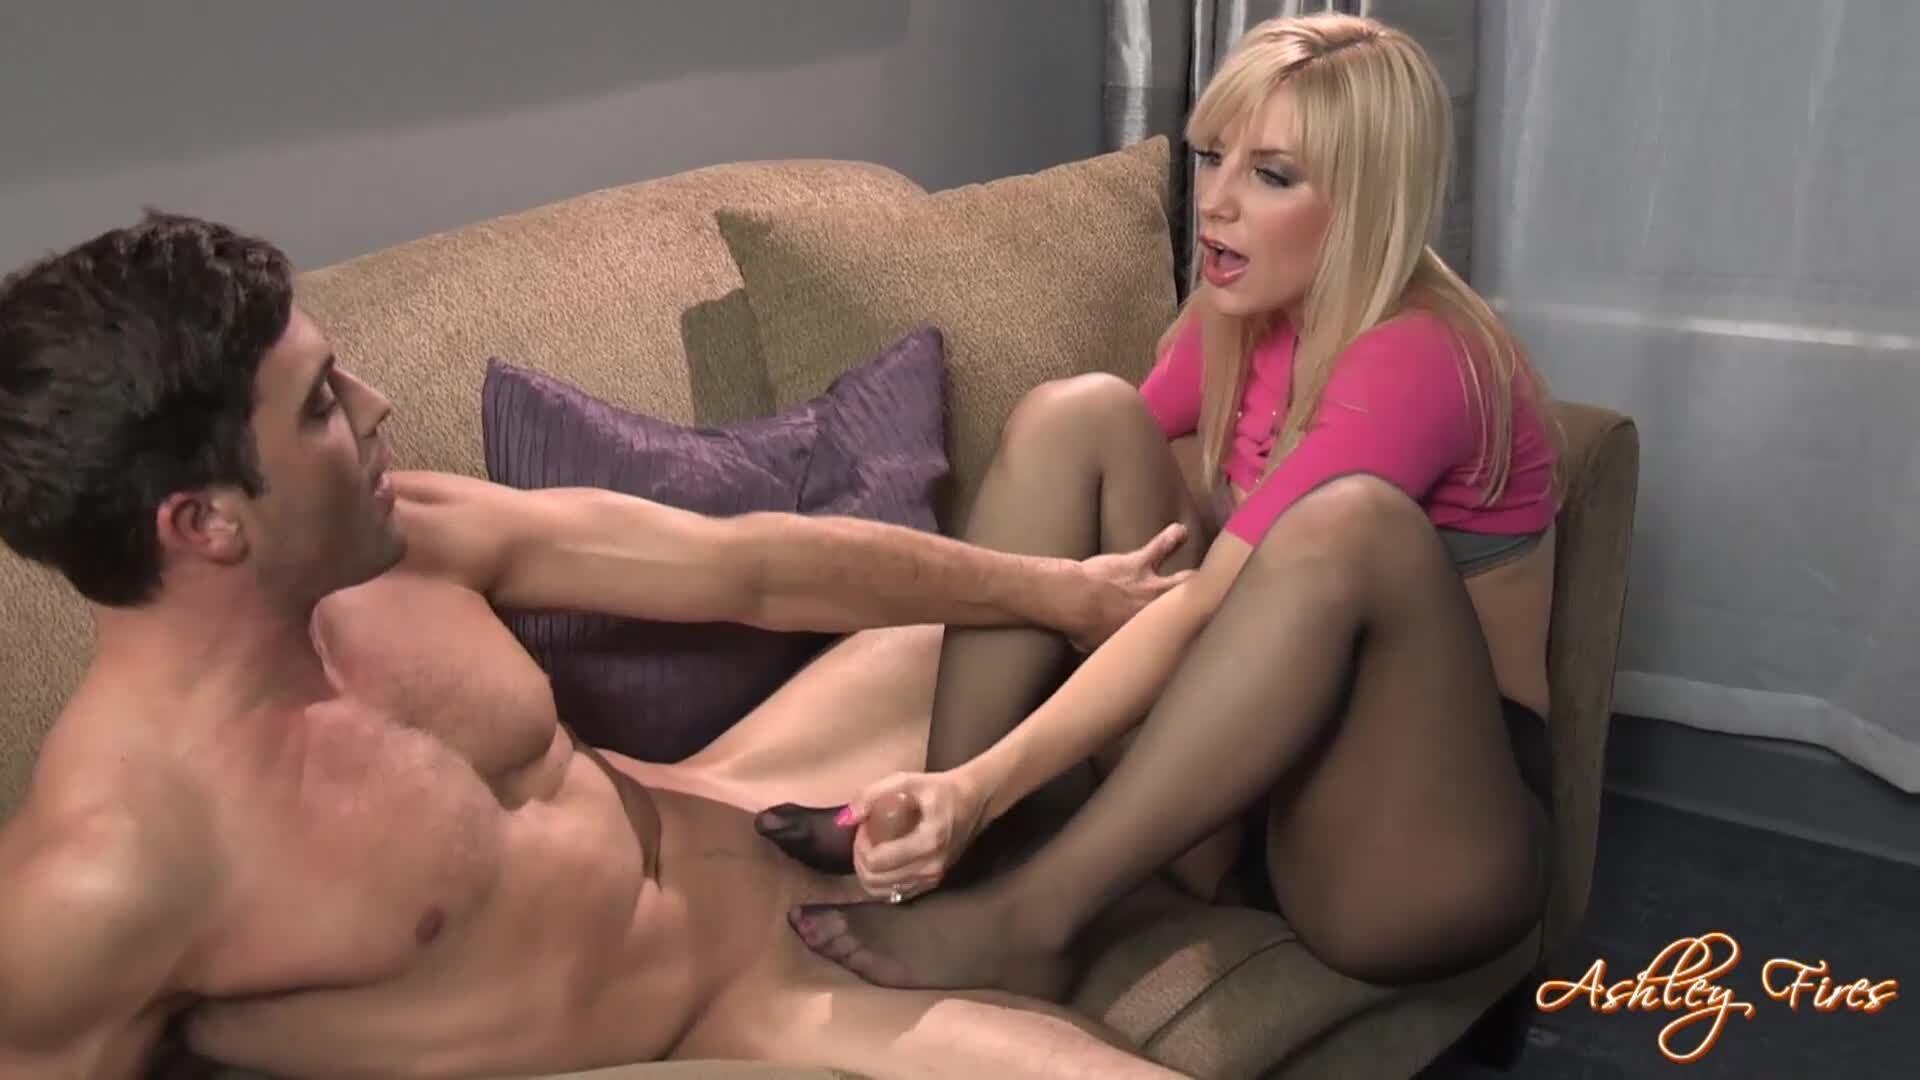 Pelicula porno ansley fires Milf Ashley Fires Fickt Stiefsohn Porndoe